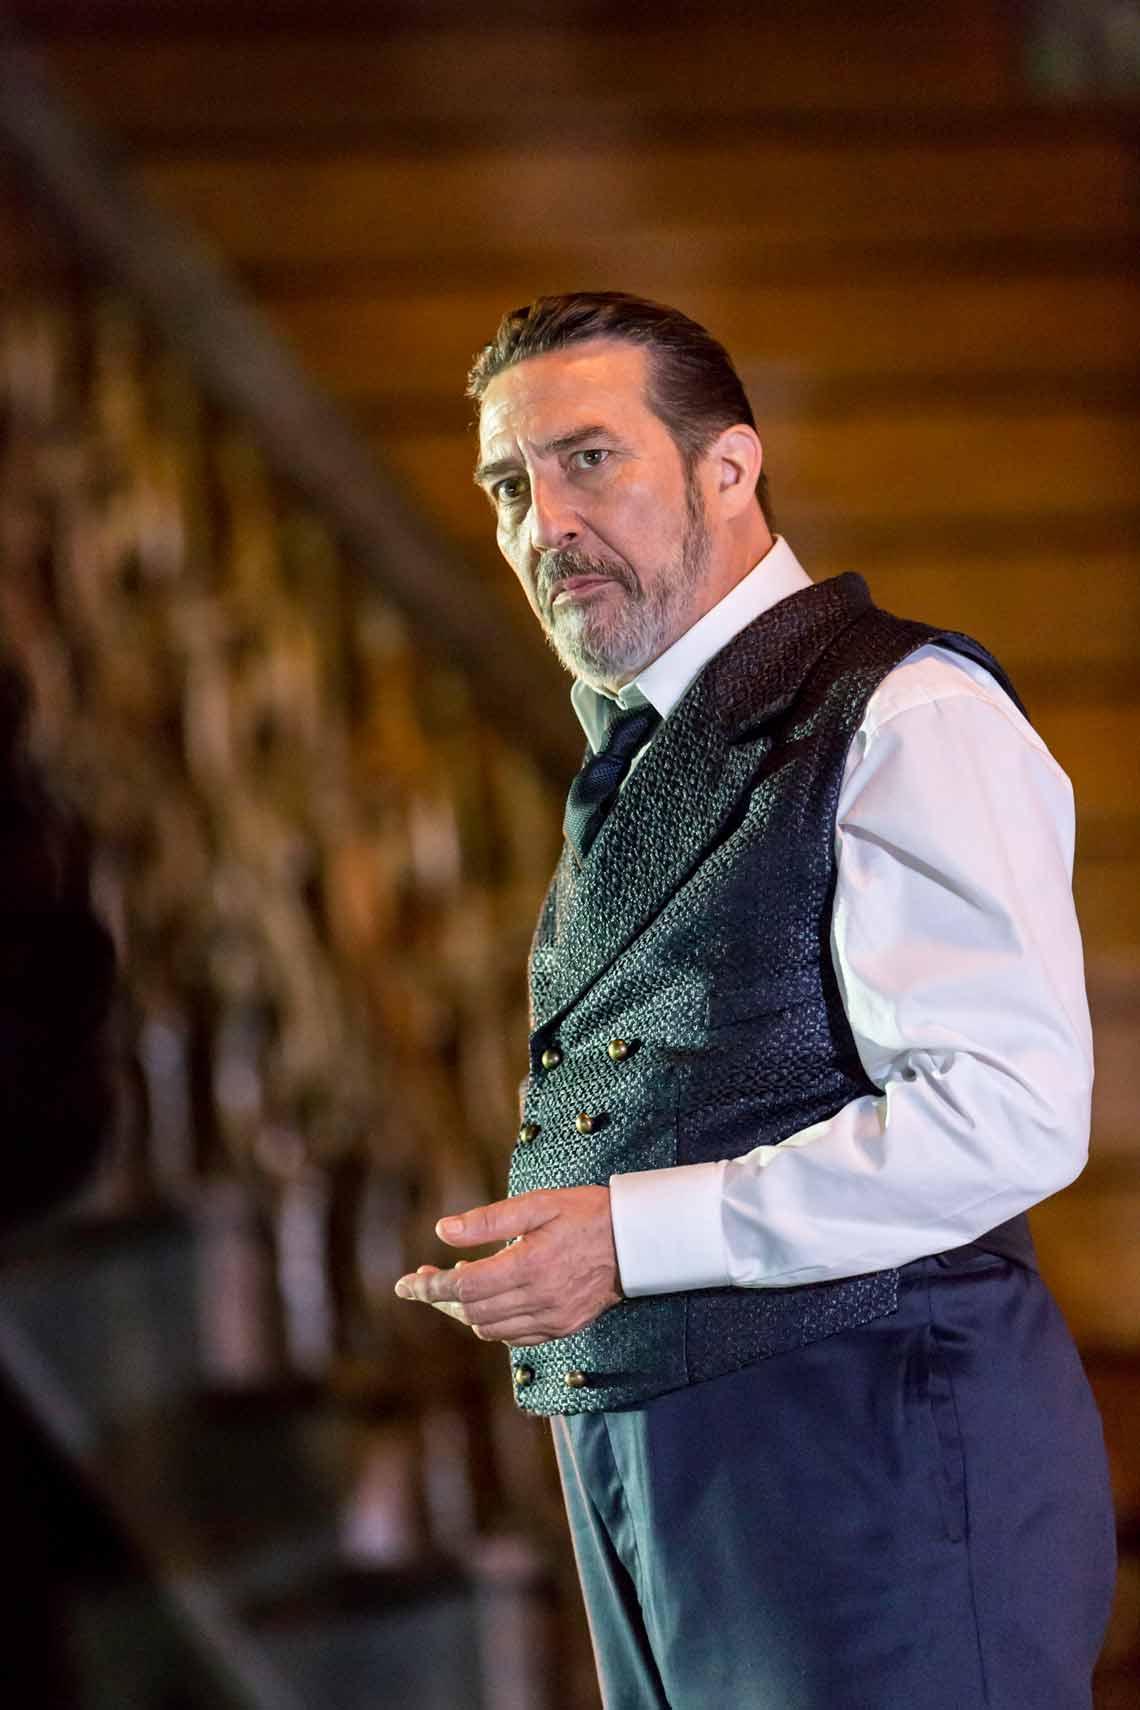 Ciarán Hinds|Hamlet |Photo: Johan Persson | Photos: Benedict Cumberbatch in Hamlet at the Barbican